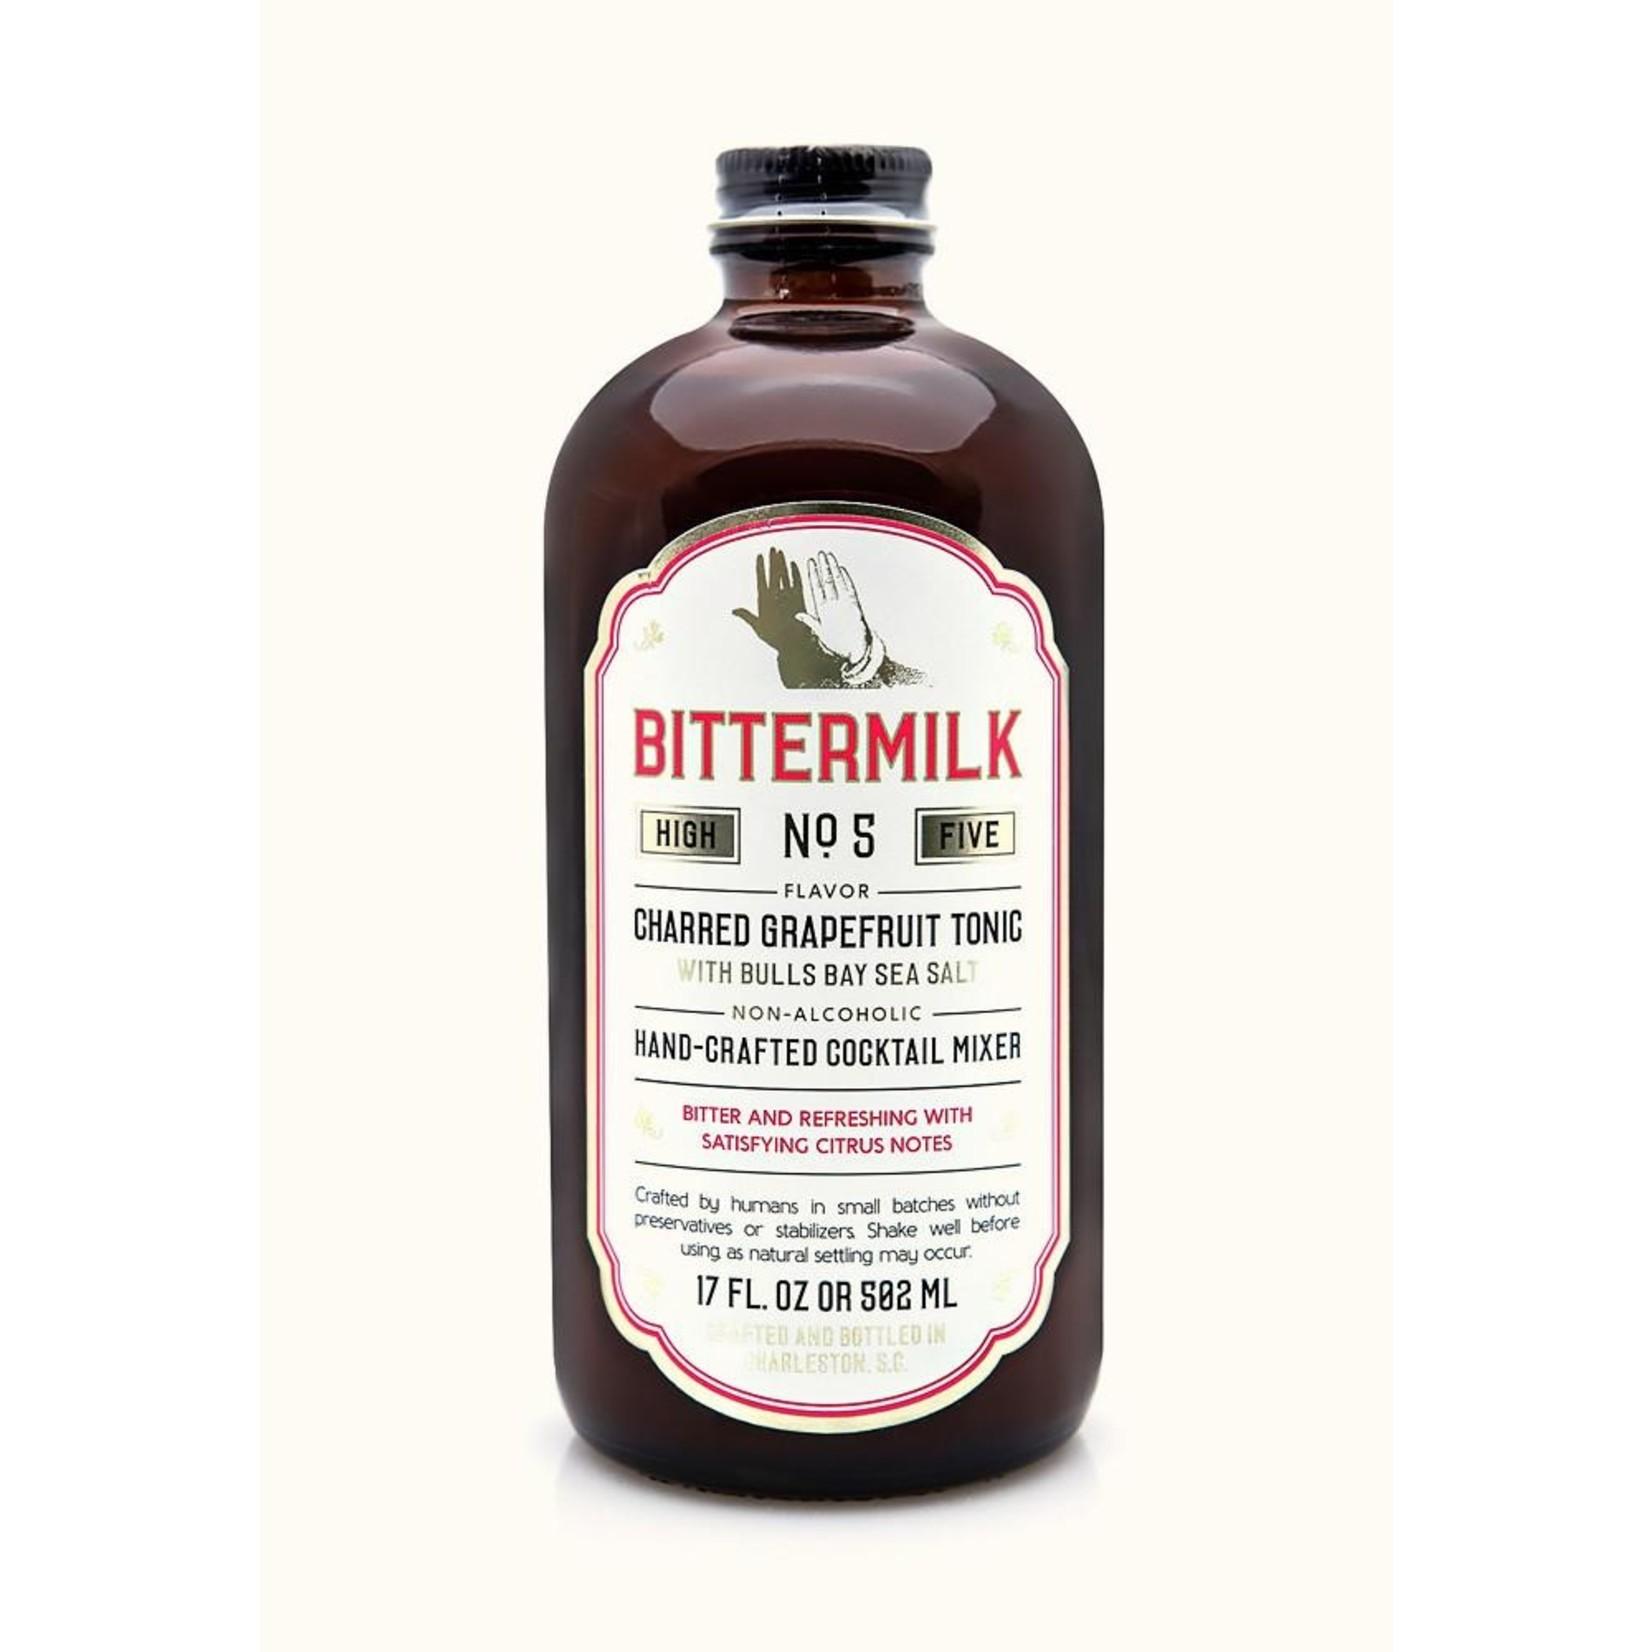 Bittermilk No.5 - Charred Grapefruit Tonic with Bulls Bay Sea Salt